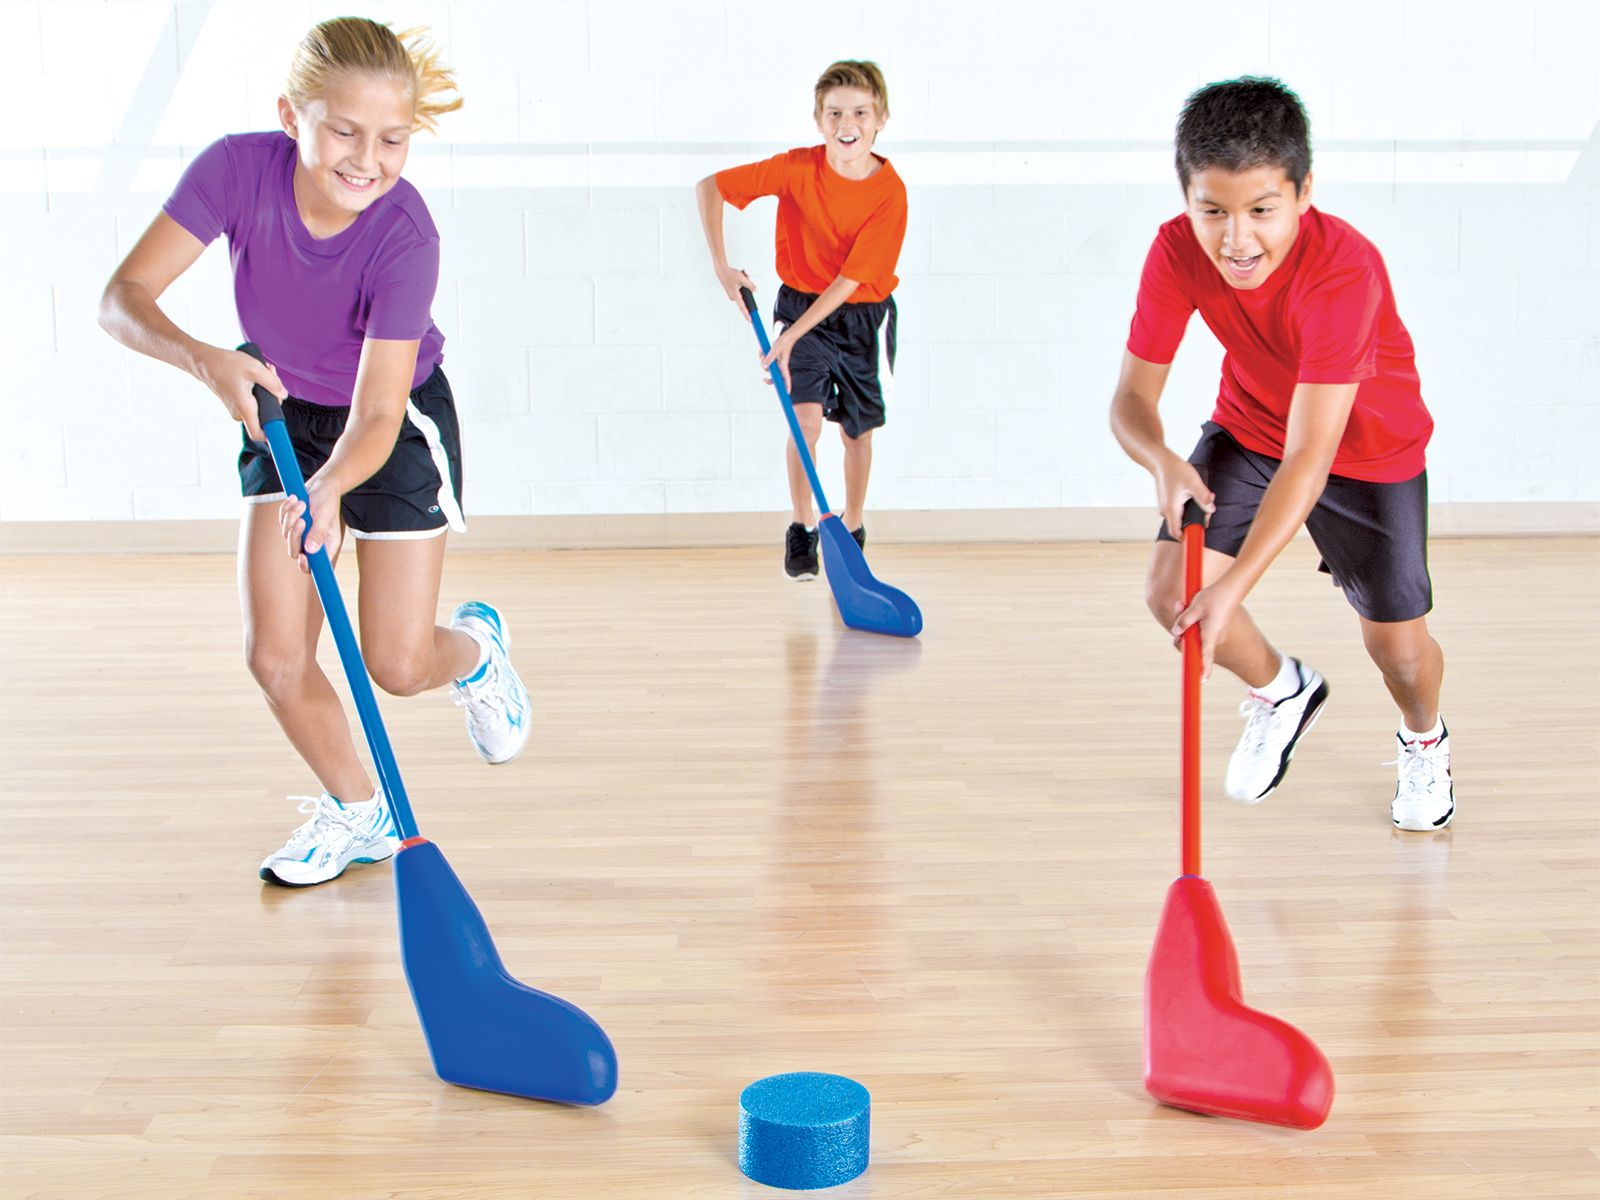 Floor Hockey Fundamentals Fitness And Fun